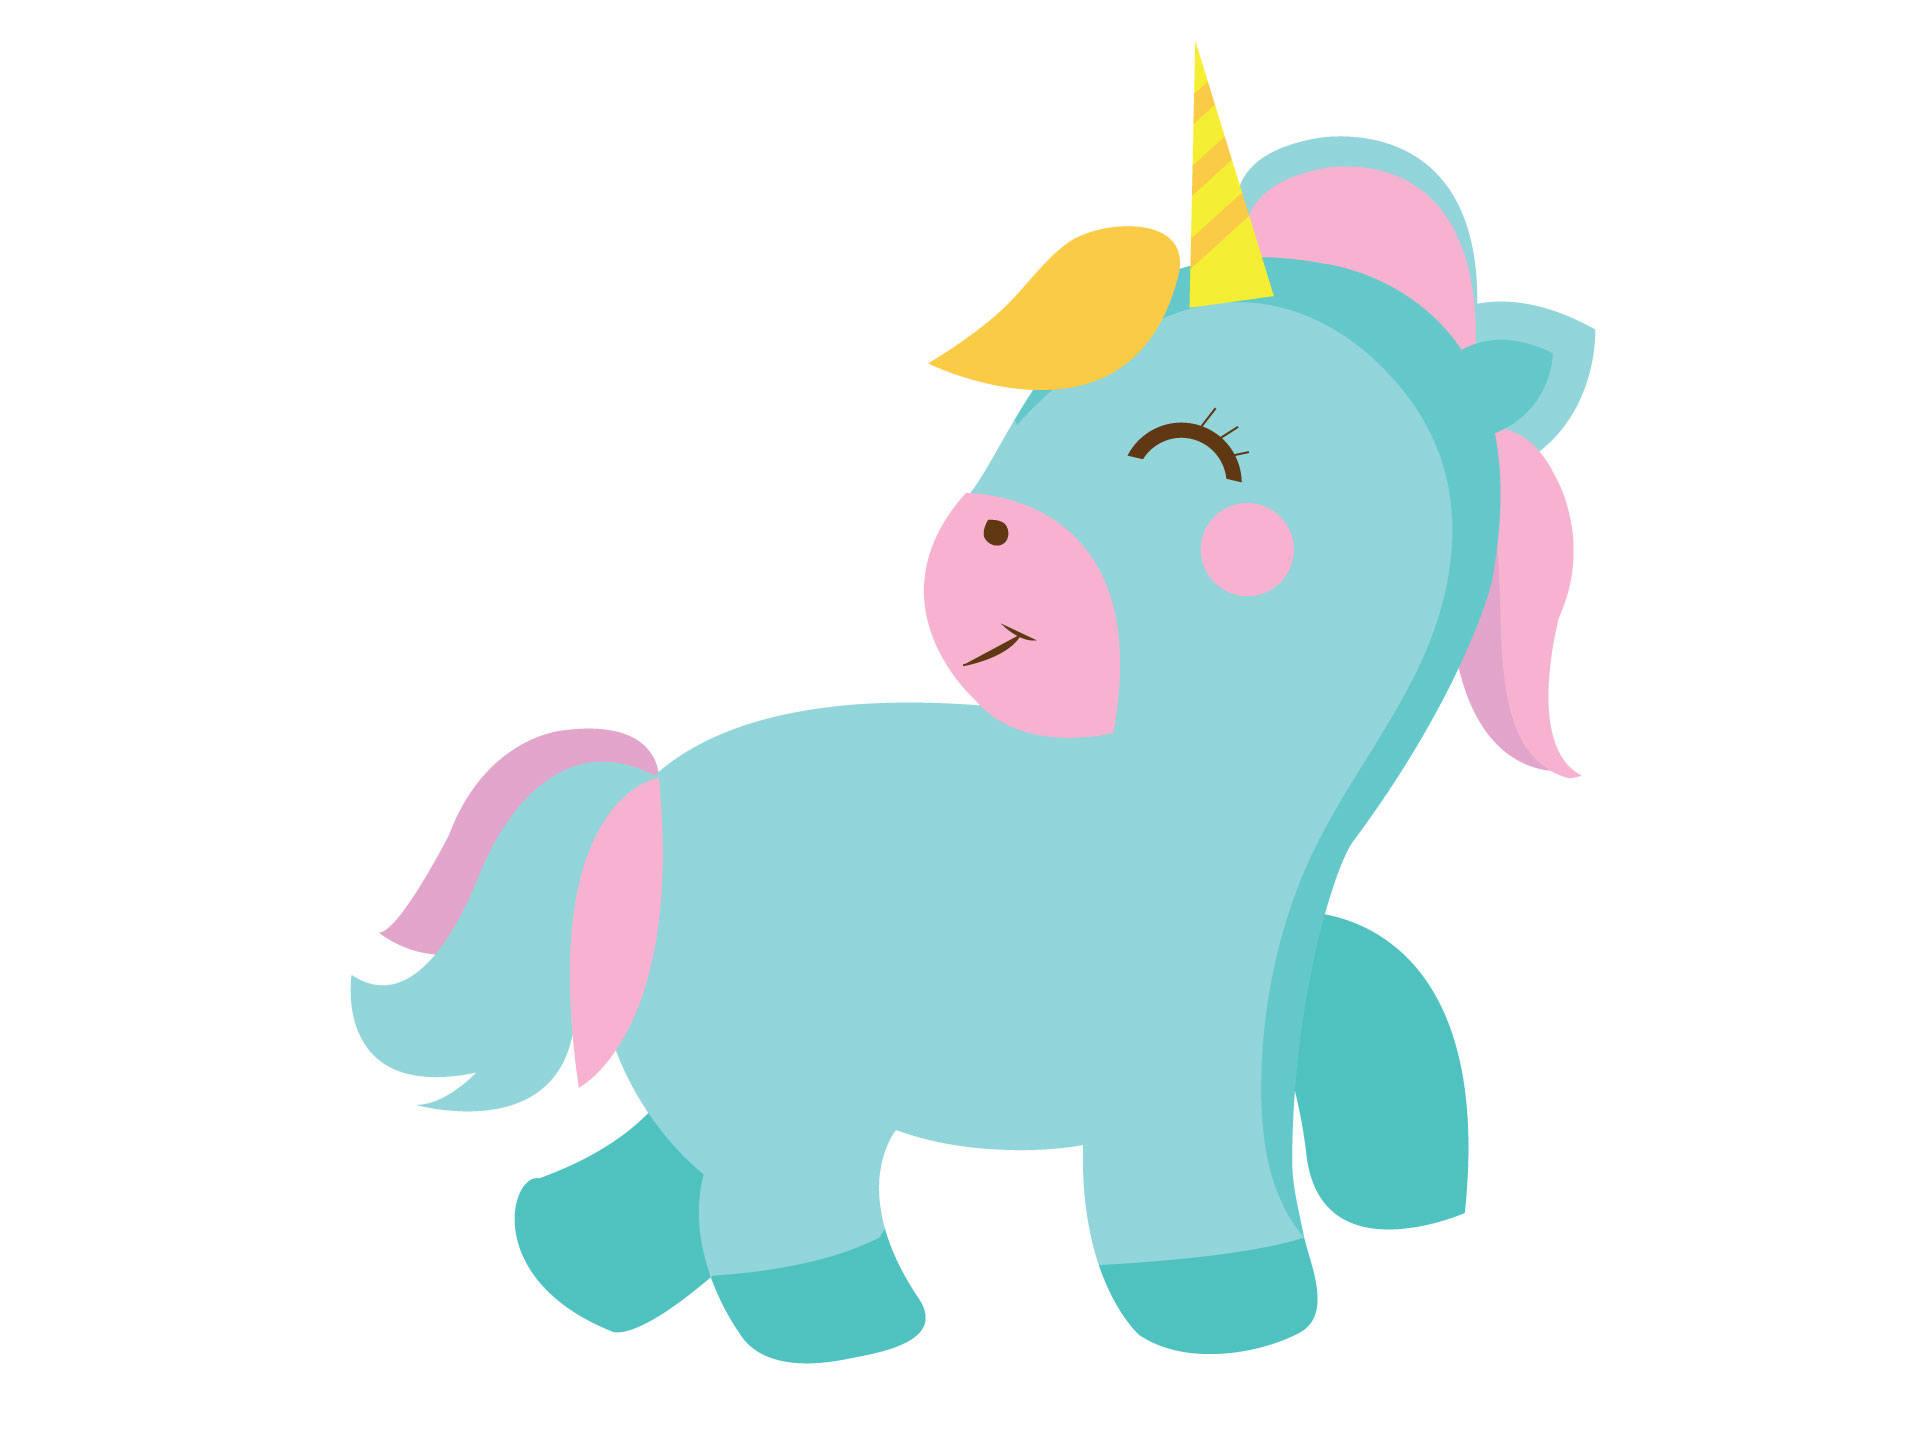 1920x1440 80% Off Sale Pink Baby Unicorn Svg Girly Sticker Clipart Diy